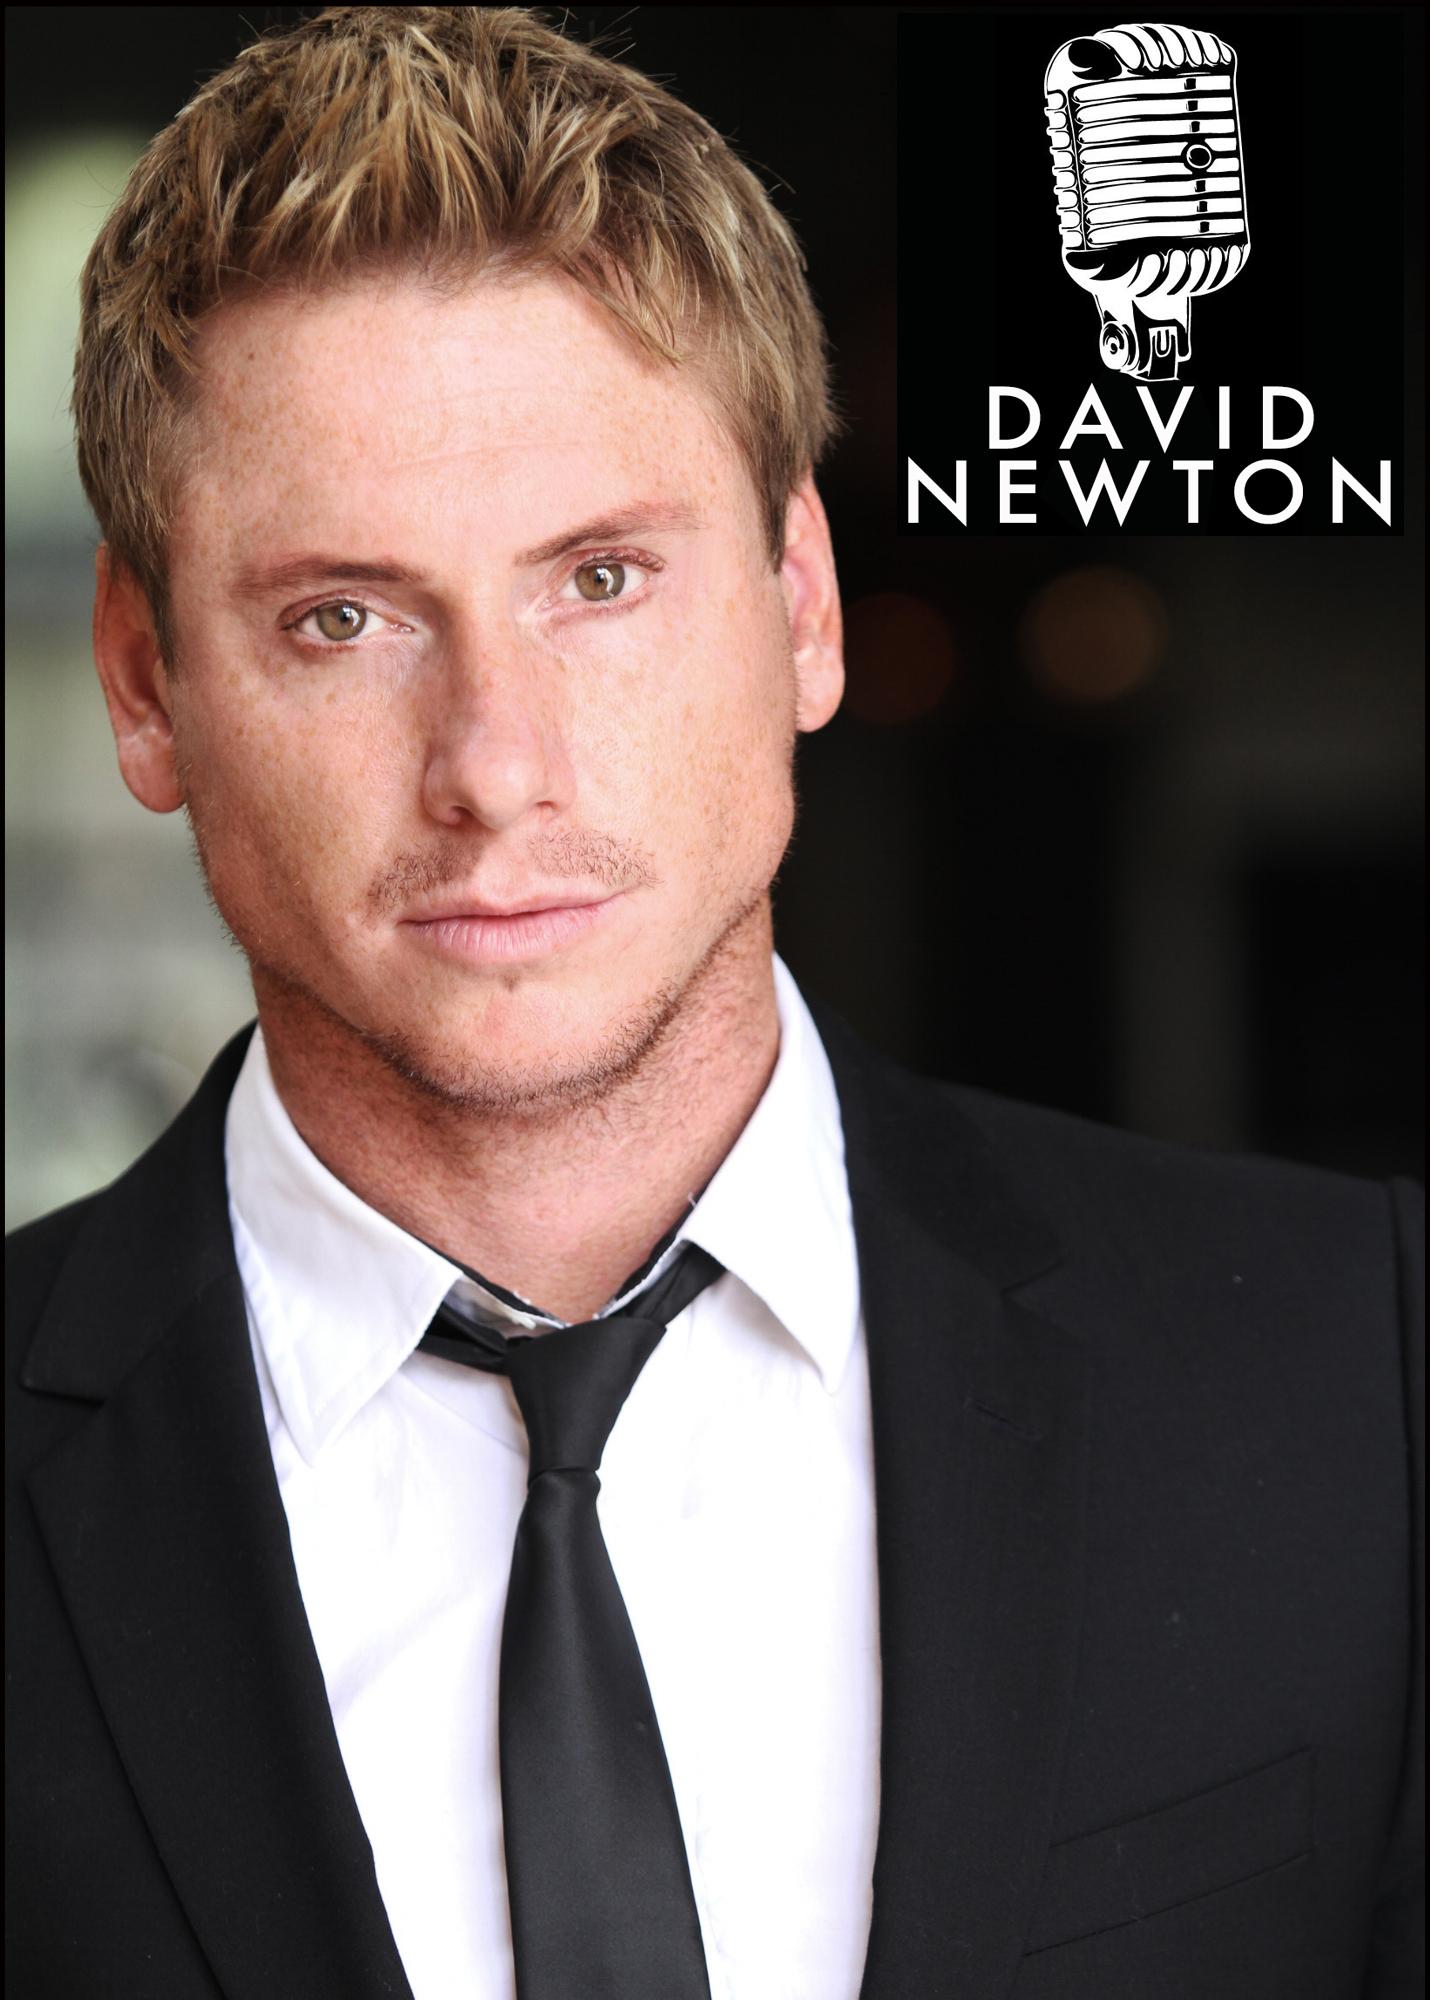 David+Newton+corporate+emcee+speaker logo.jpg